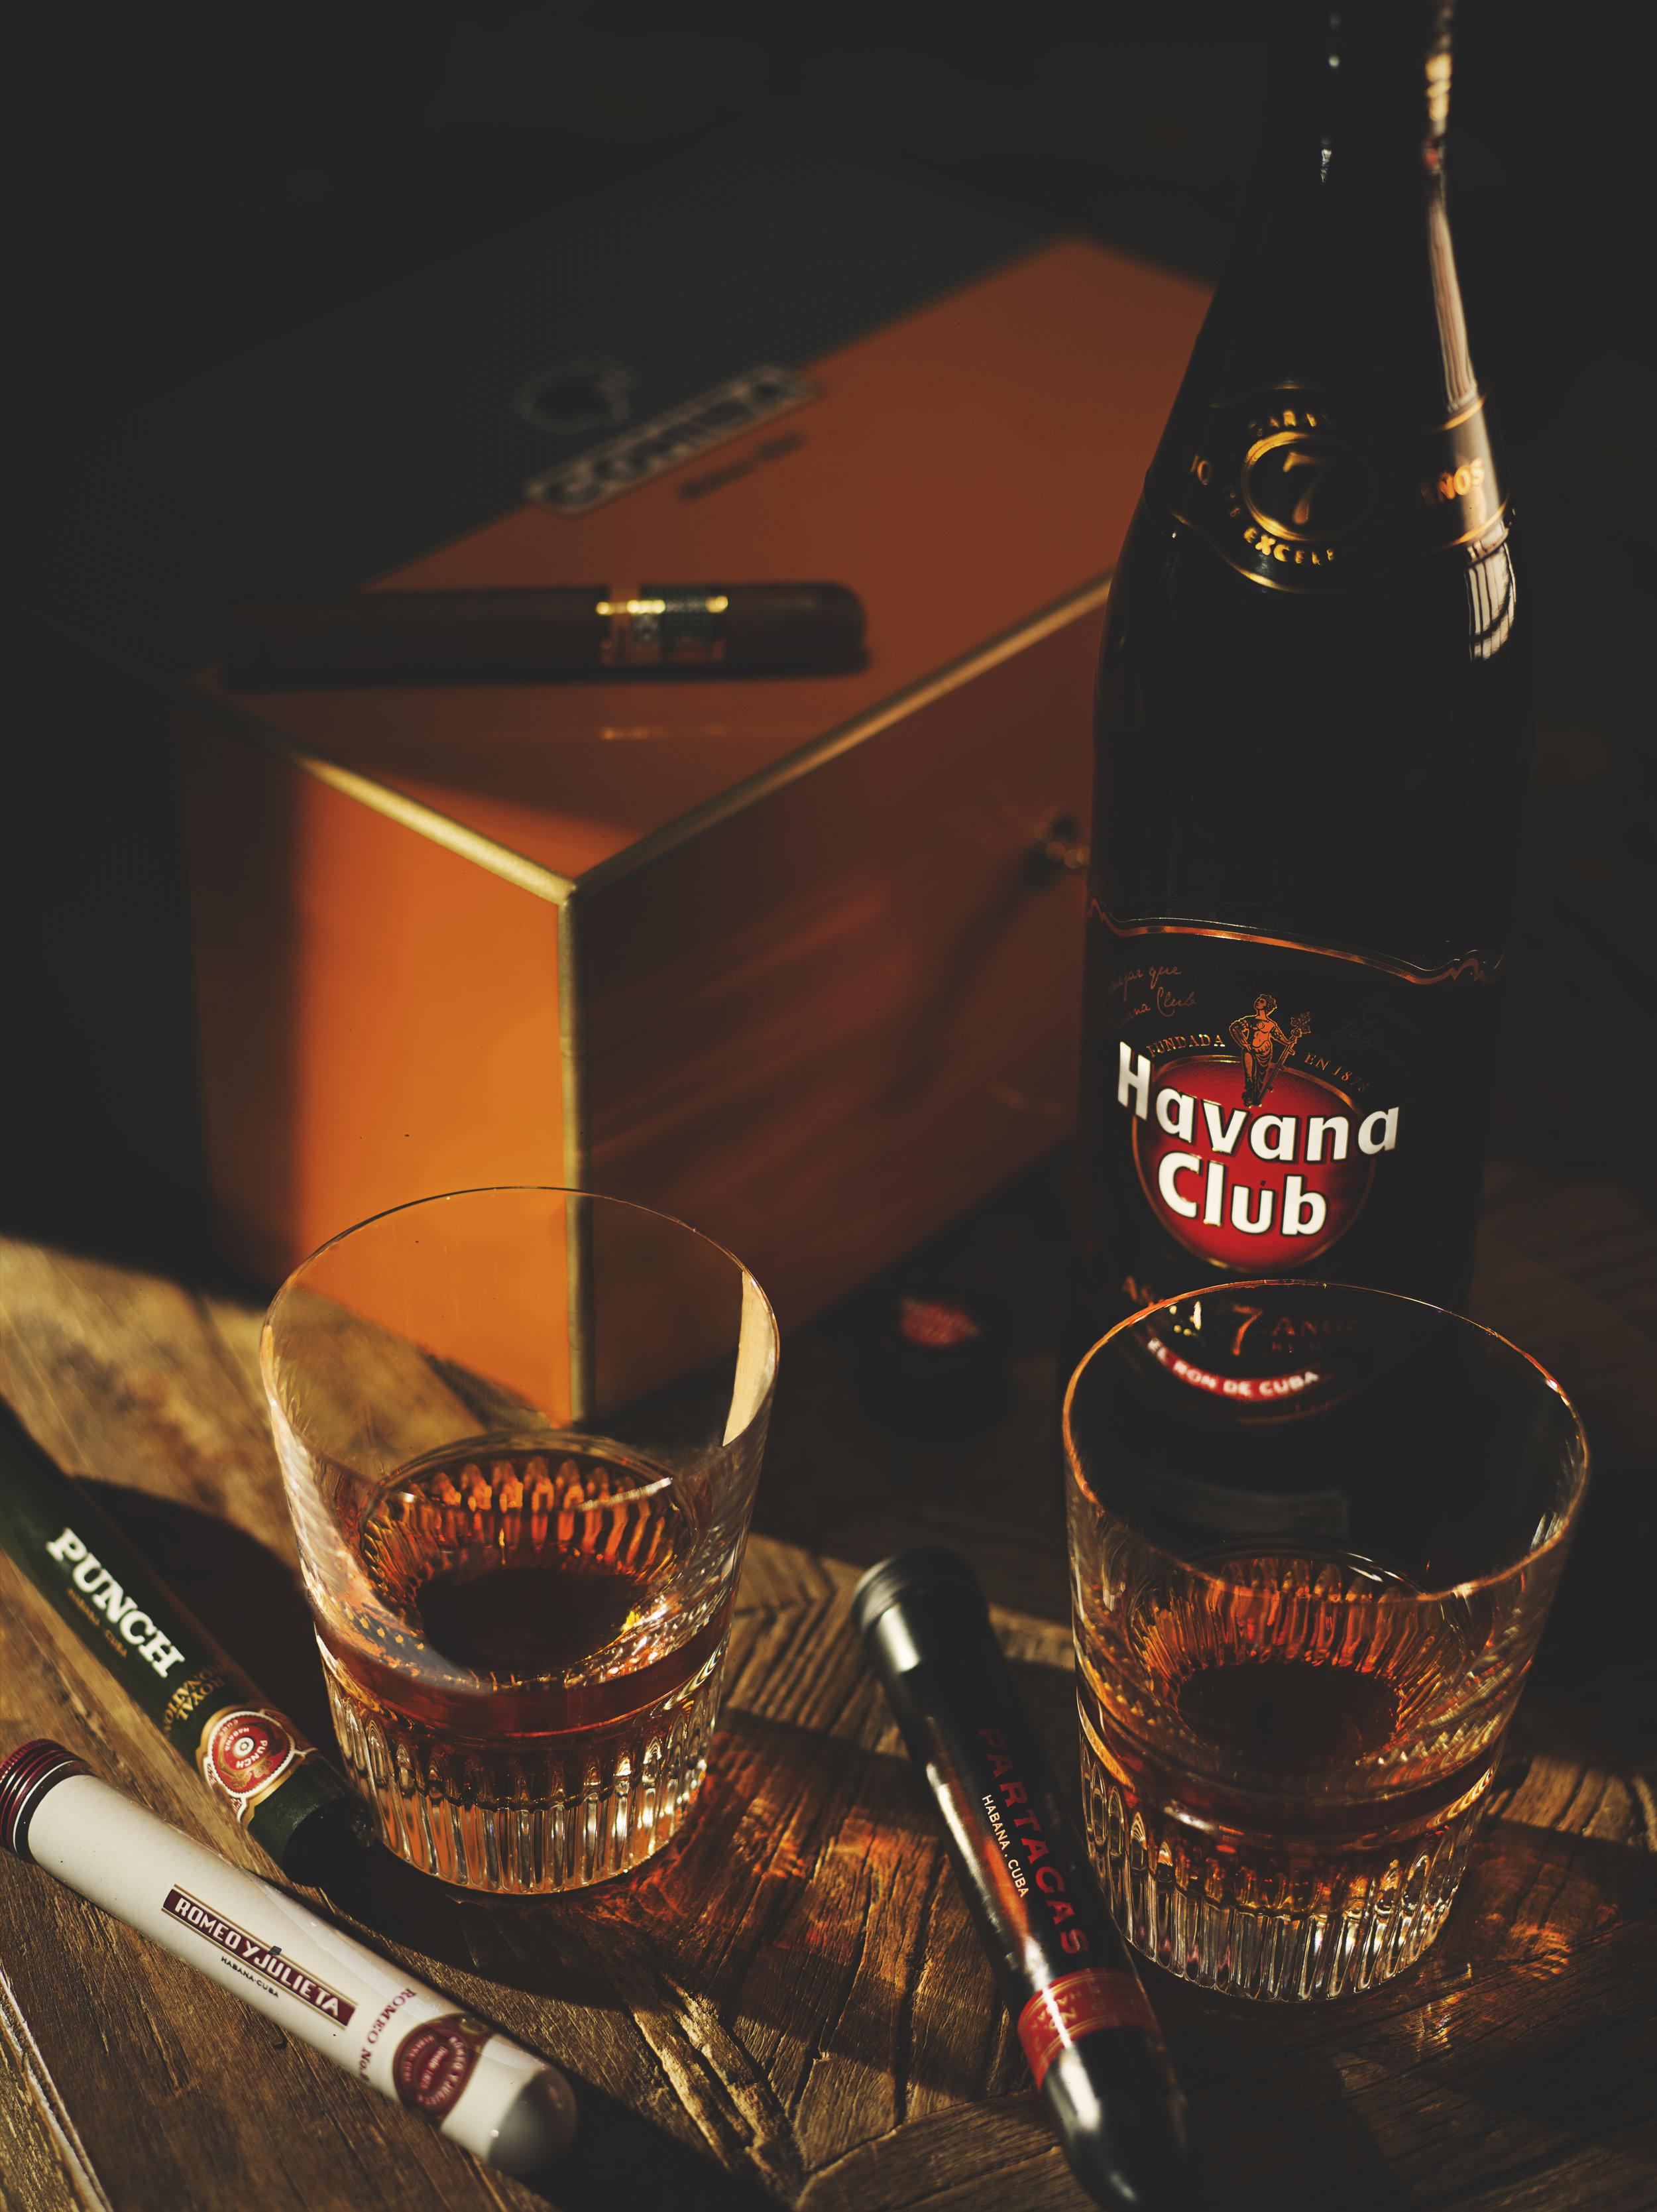 Havana Club alcoholic drinks photographer